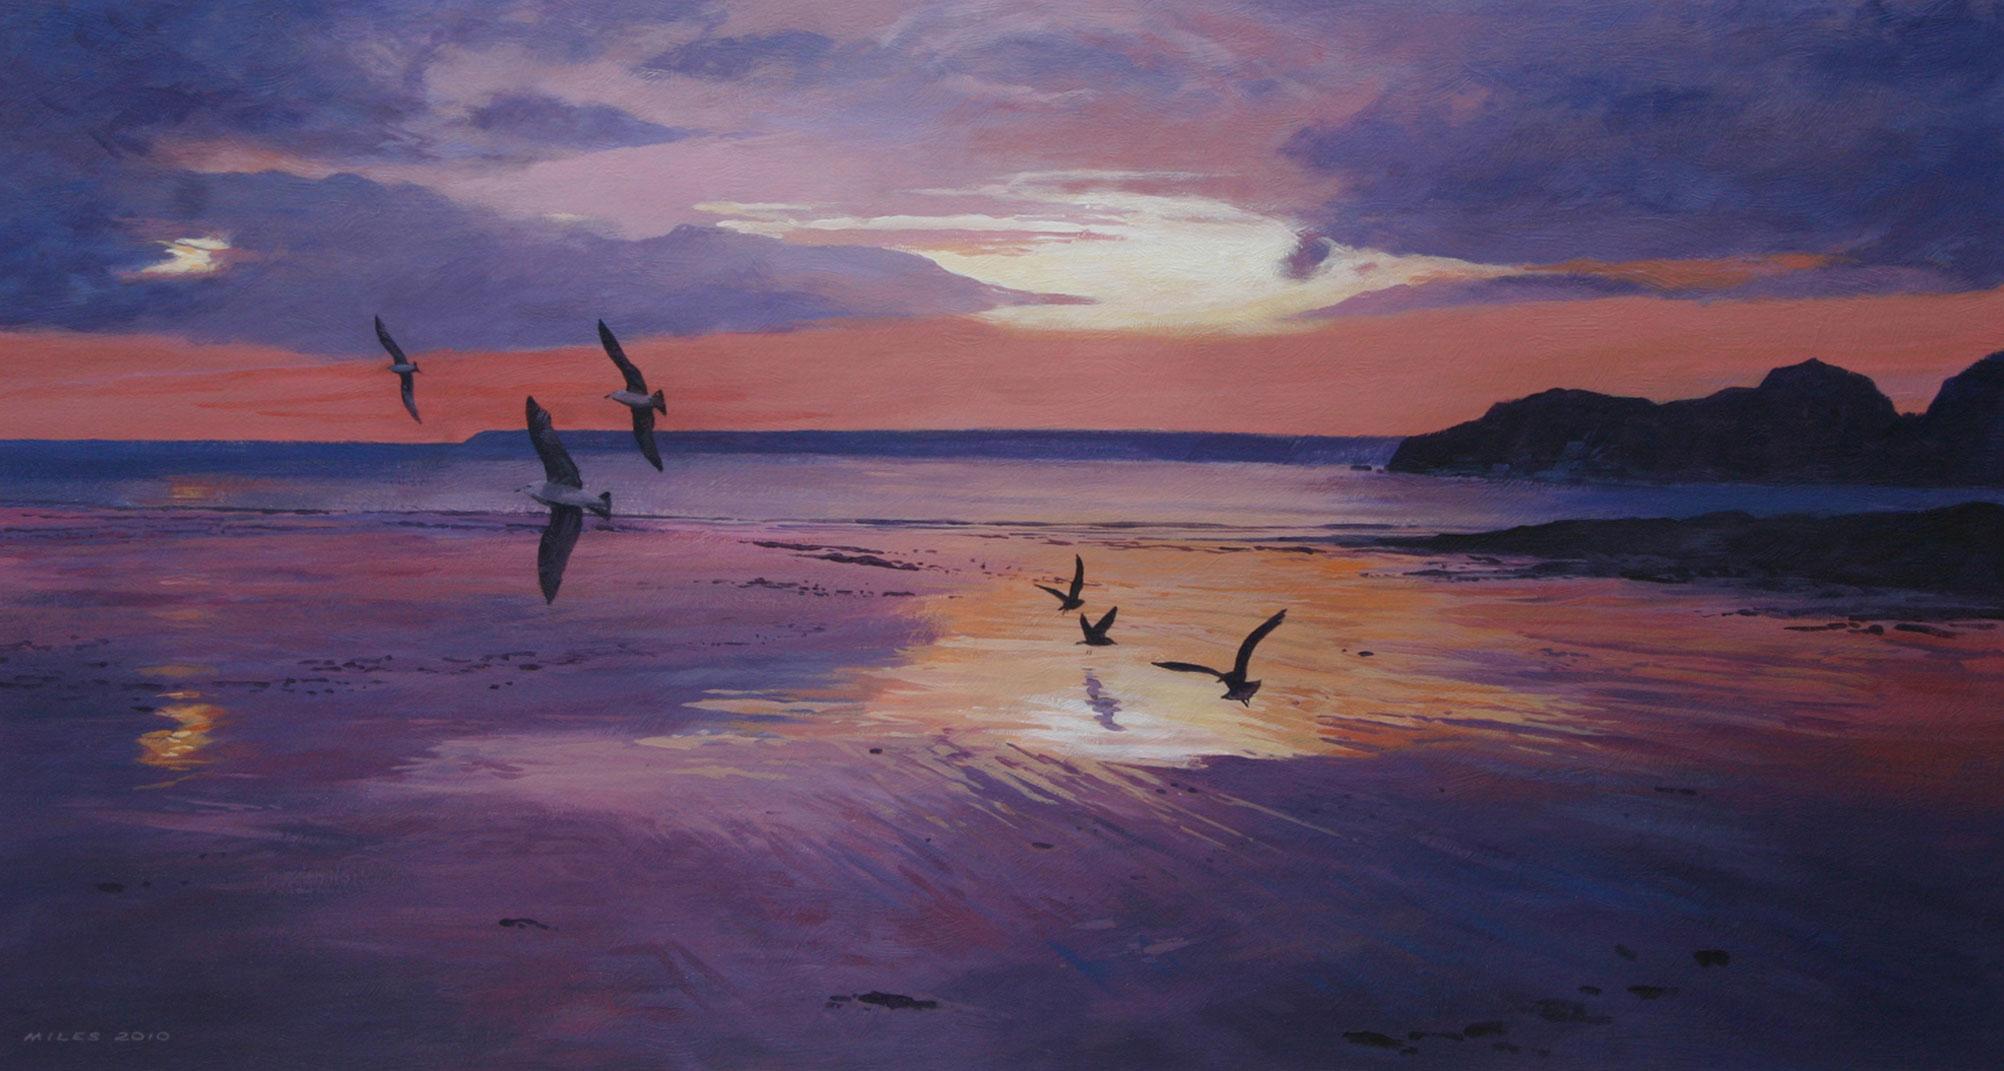 Gerry_Miles_devonpaint_devon_Sunset_on_Harbour_Beach.jpg